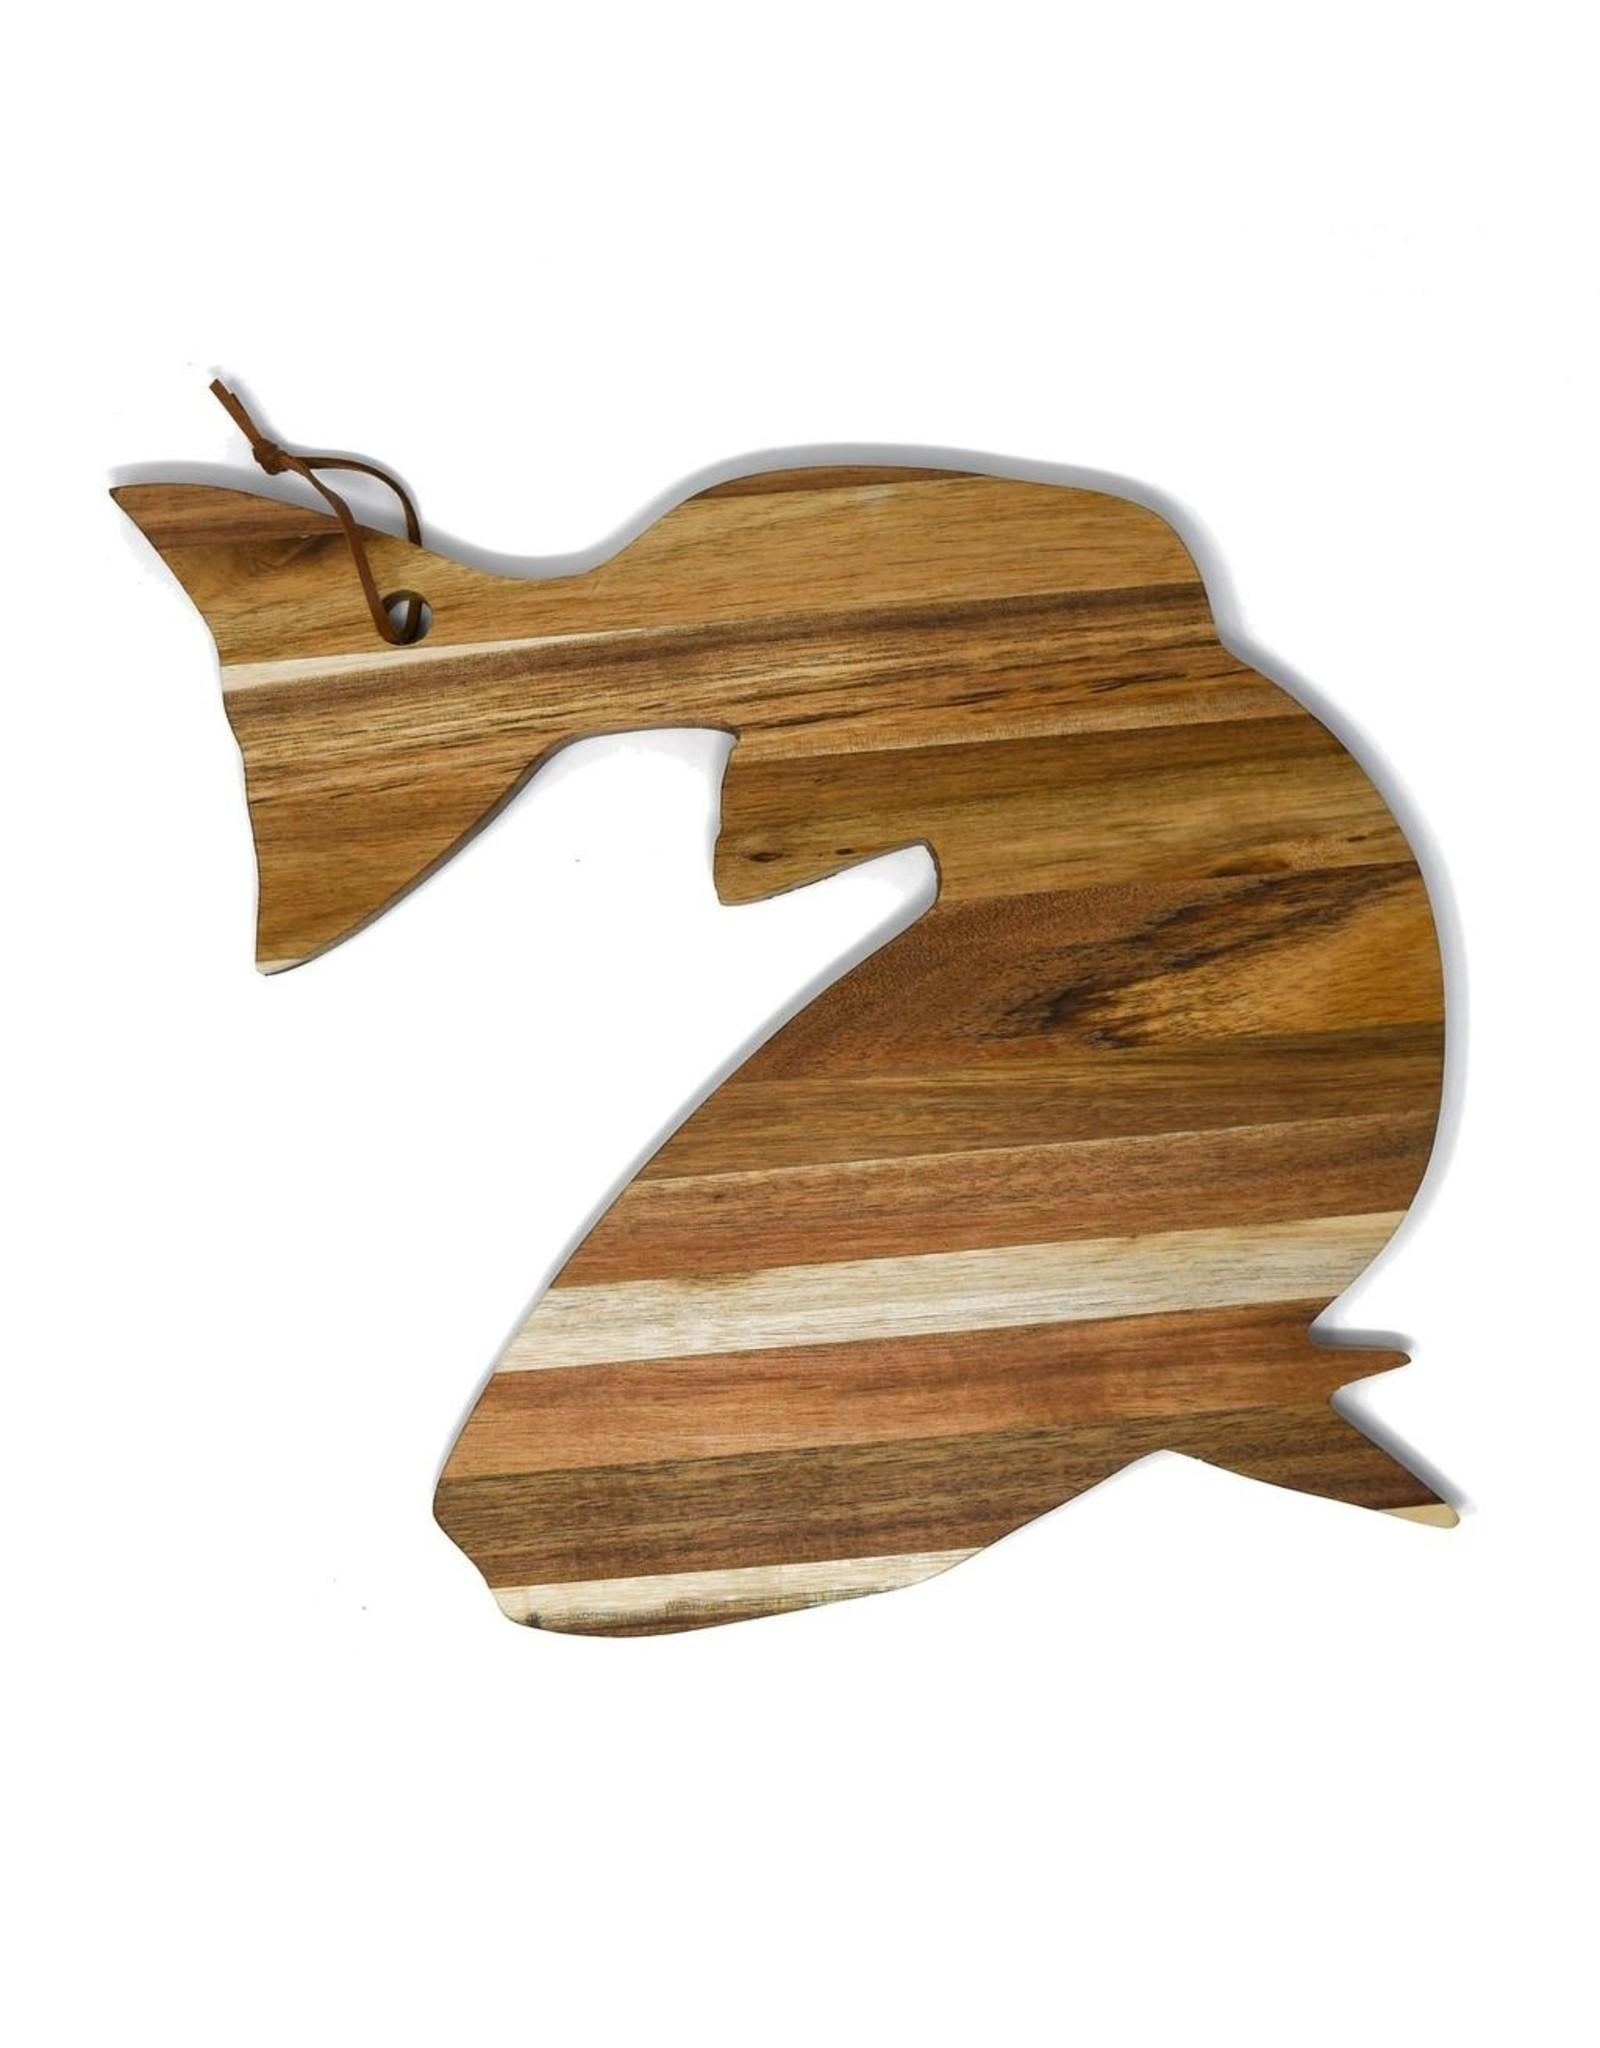 Roux Brand Acacia Wood Serve Board - Redfish